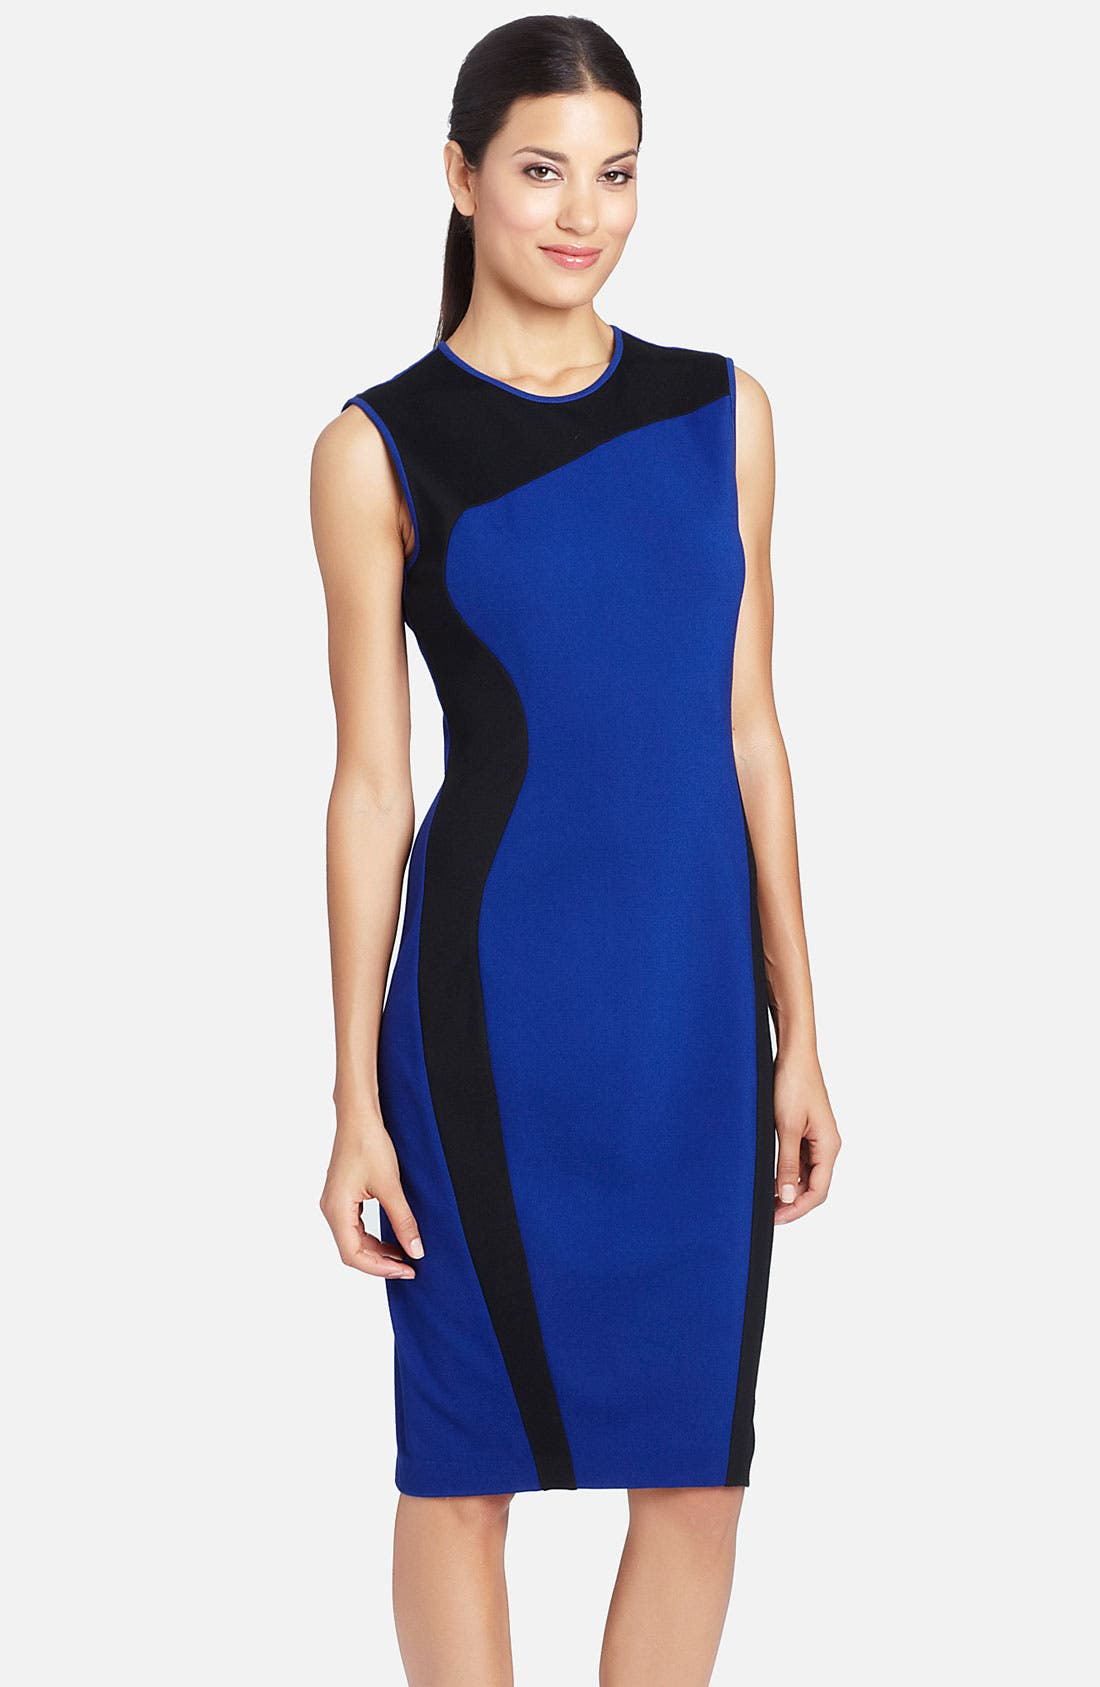 Alternate Image 1 Selected - Cynthia Steffe Swirl Contrast Panel Ponte Sheath Dress